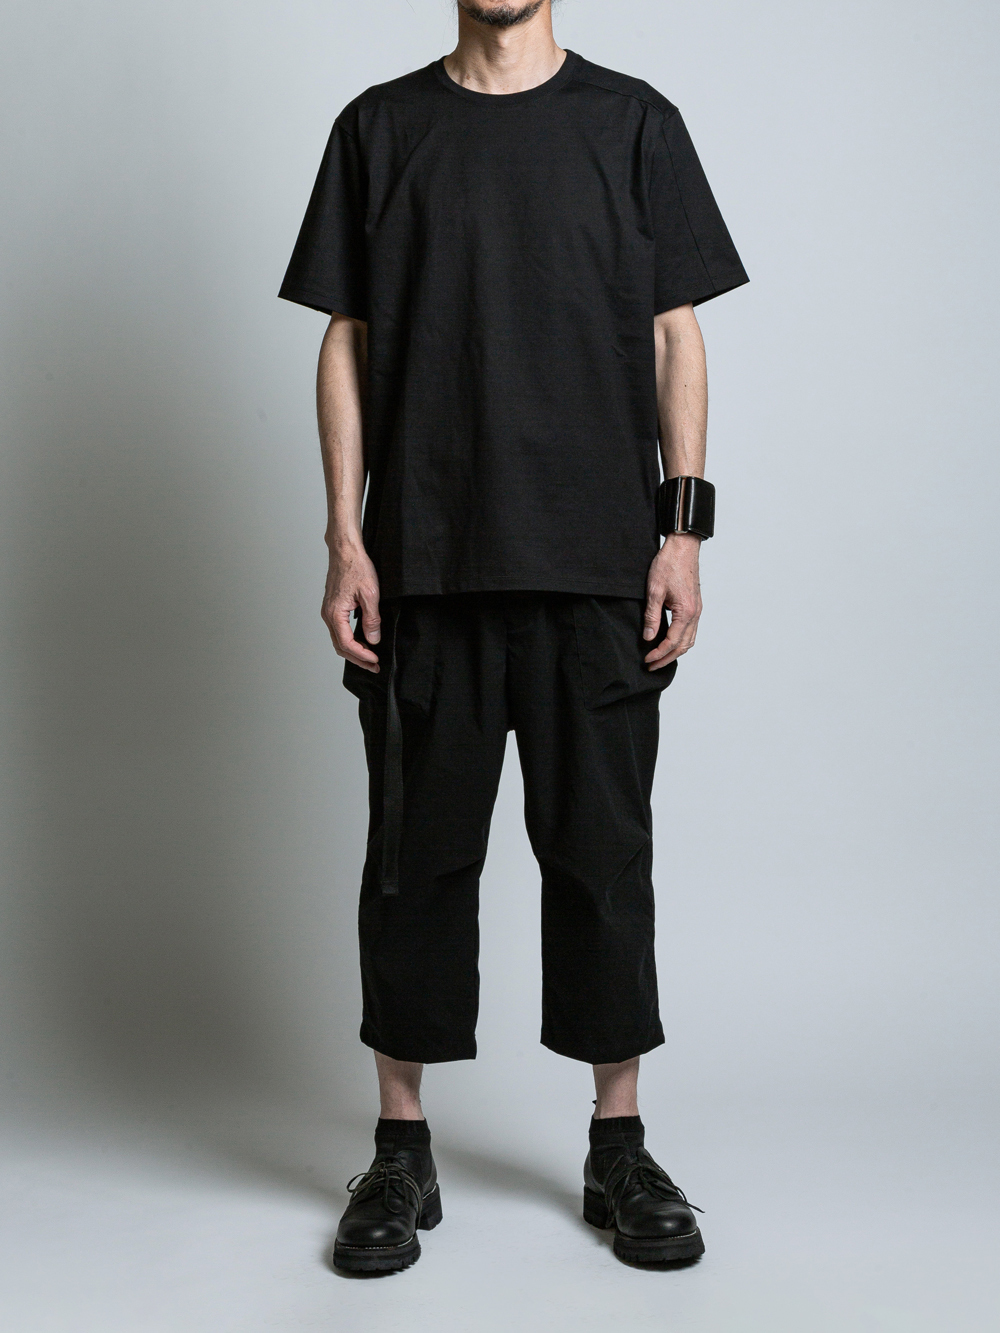 VI-SP-065-01 / 2枚パックTシャツ BLACK×2